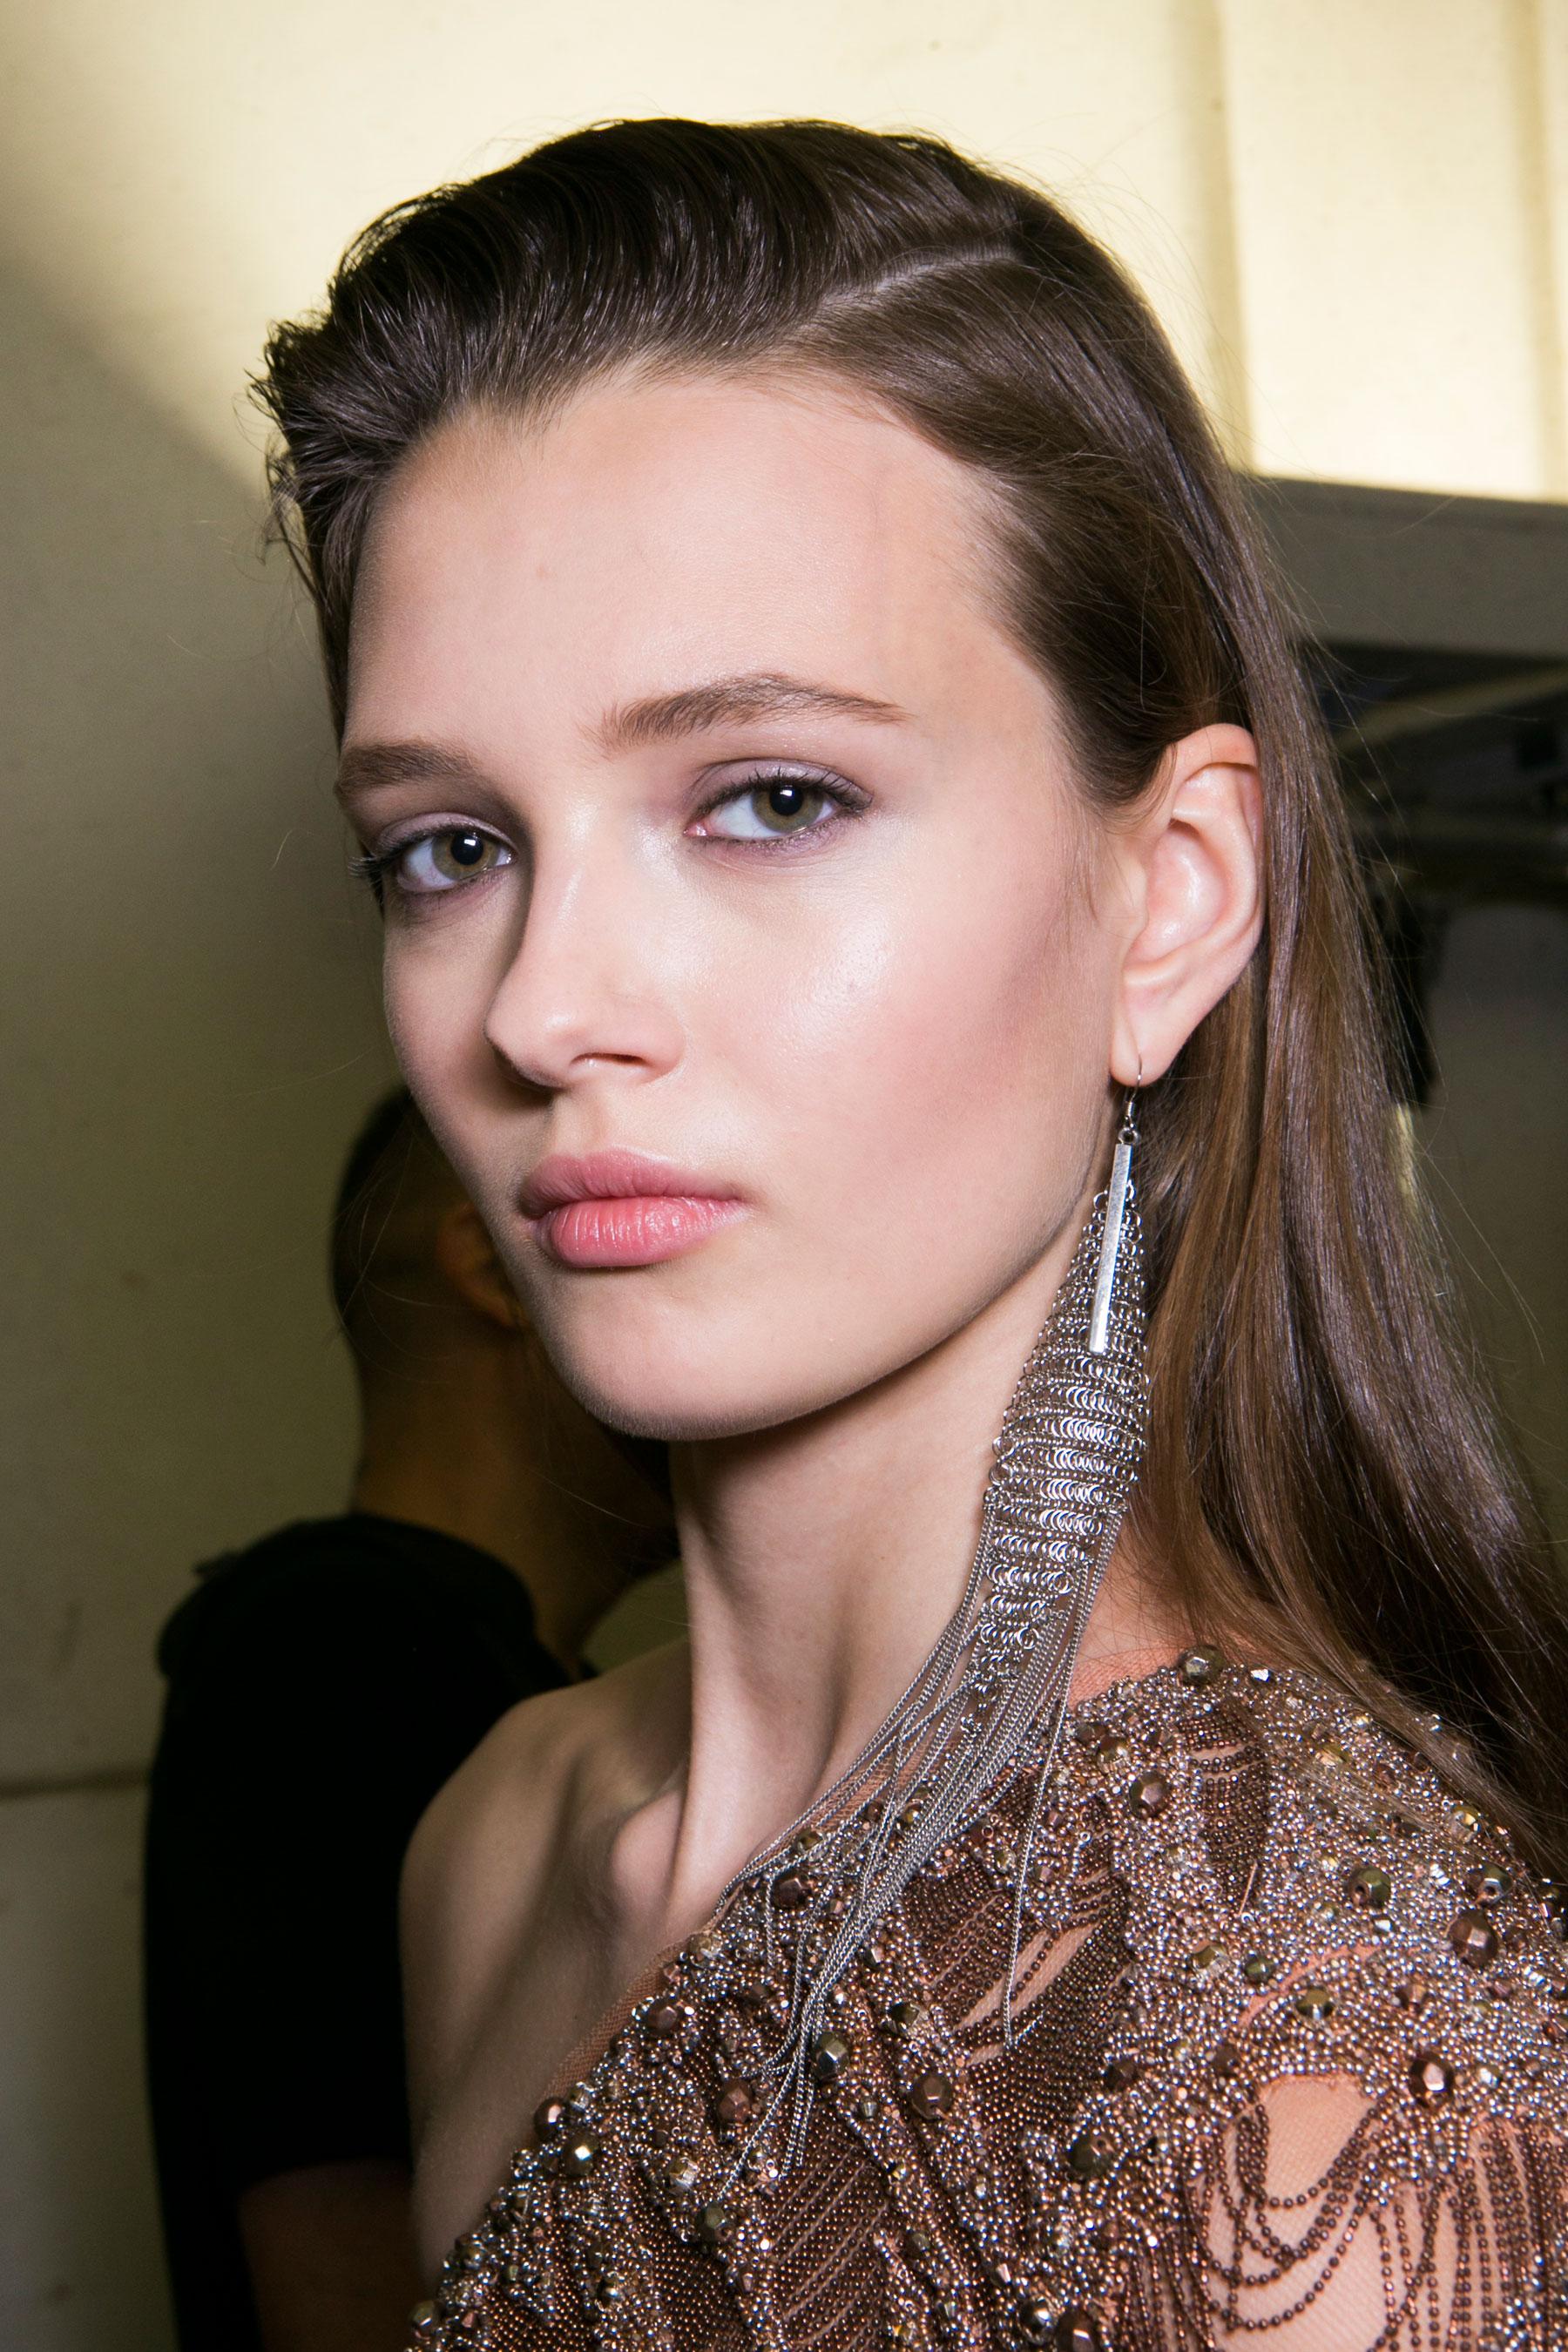 Roberto-Cavalli-Backstage-beauty-spring-2016-close-up-fashion-show-the-impression-057